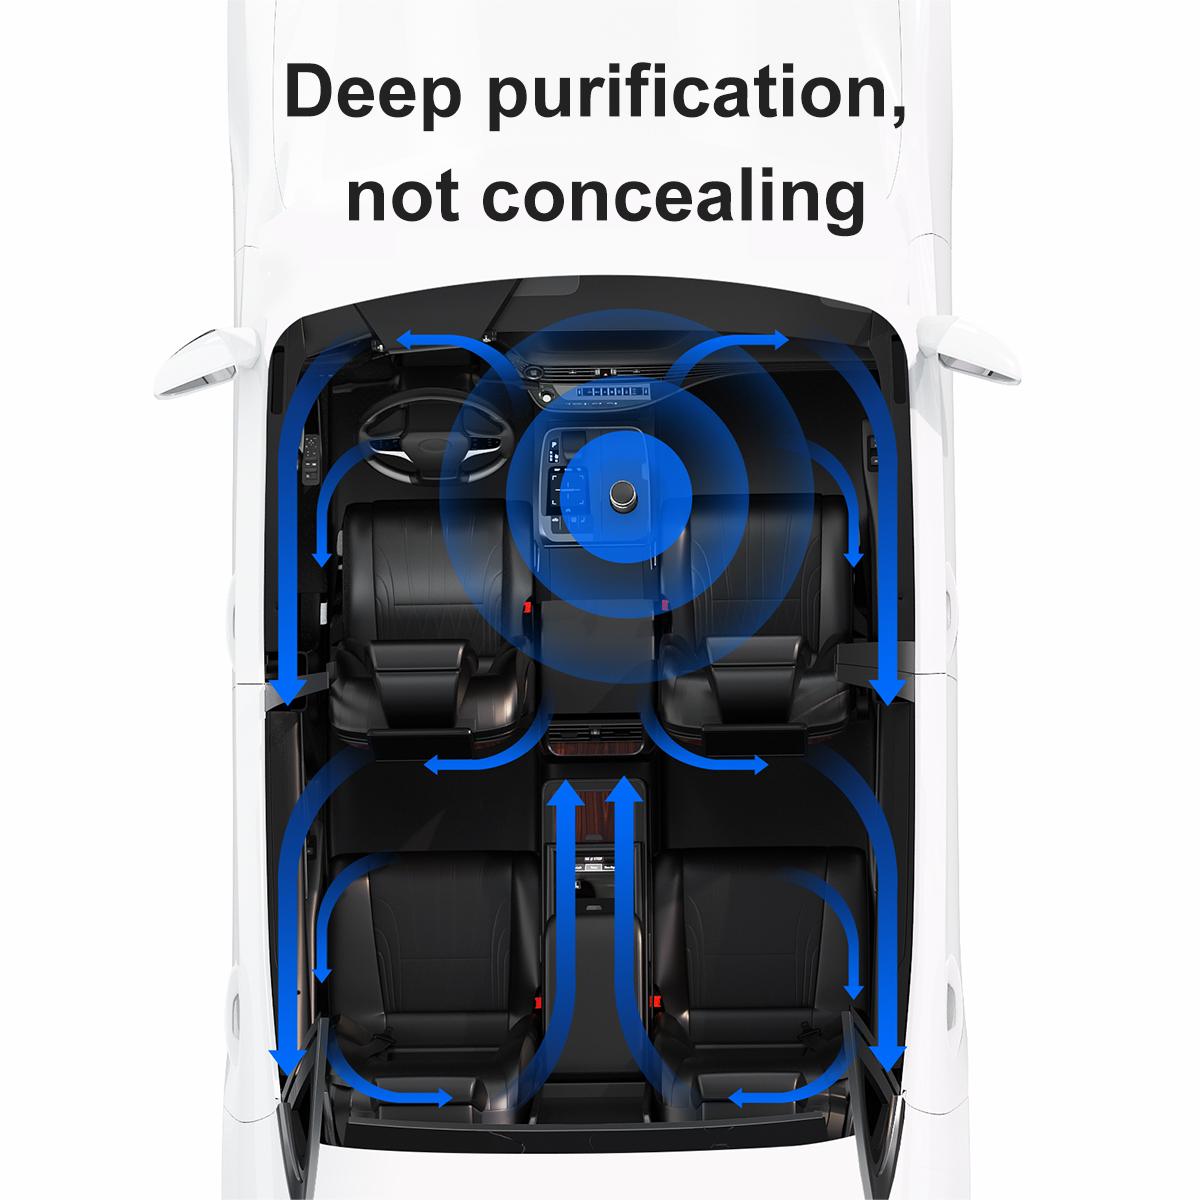 Baseus Car Air Purifier Eliminate Formaldehyde Smog Negative Ion Aromatherapy Machine